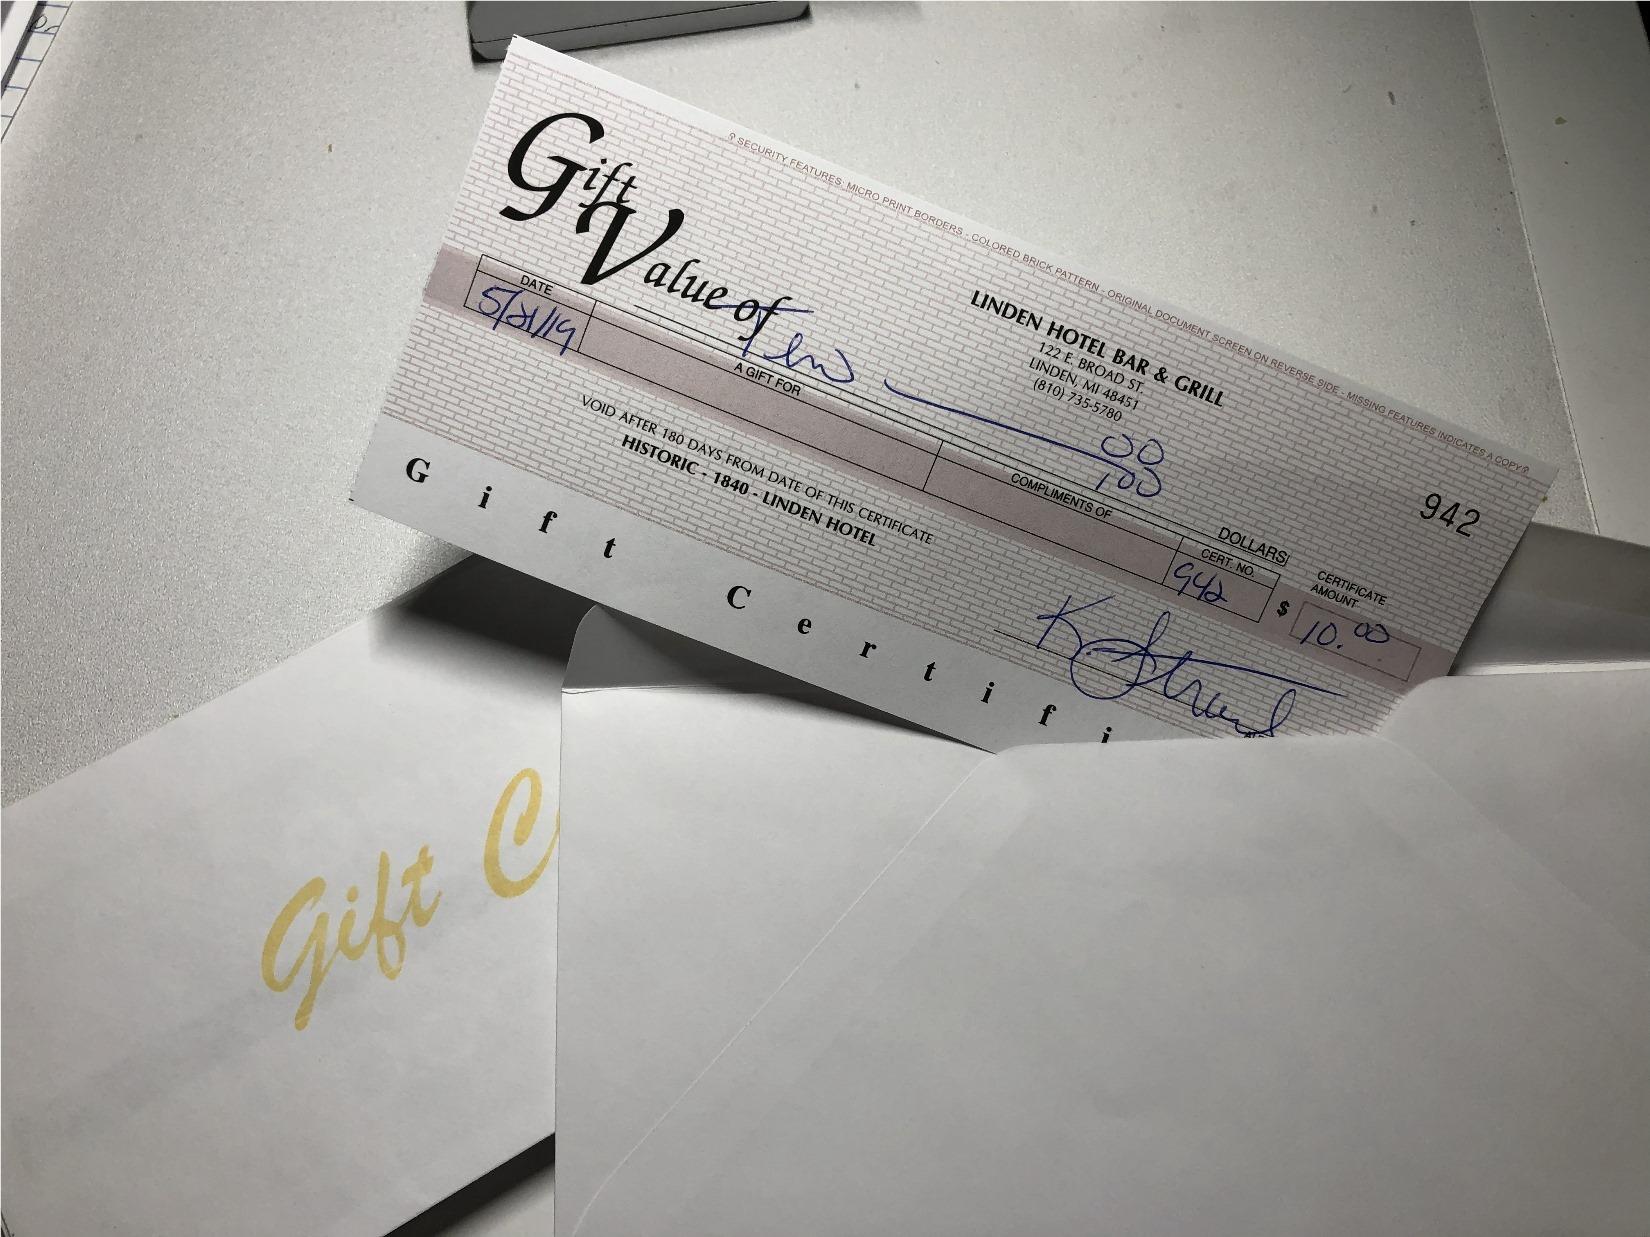 gift-certificates-for-vets